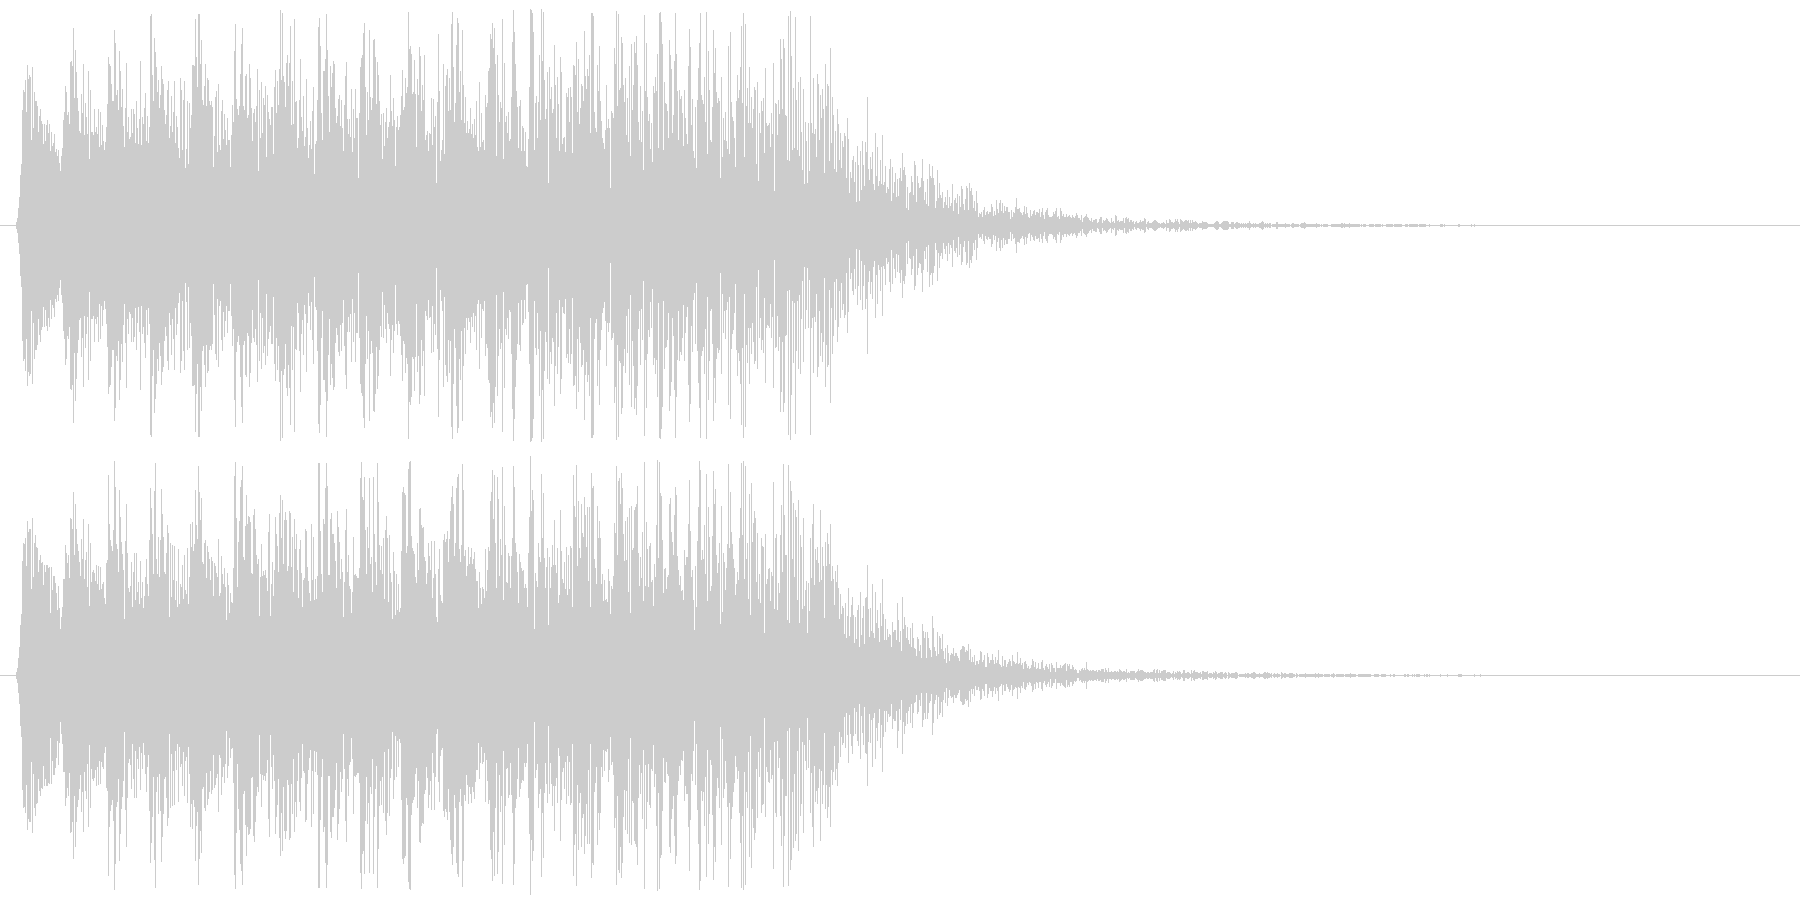 8bitなパワーダウン 下降音フレーズの未再生の波形